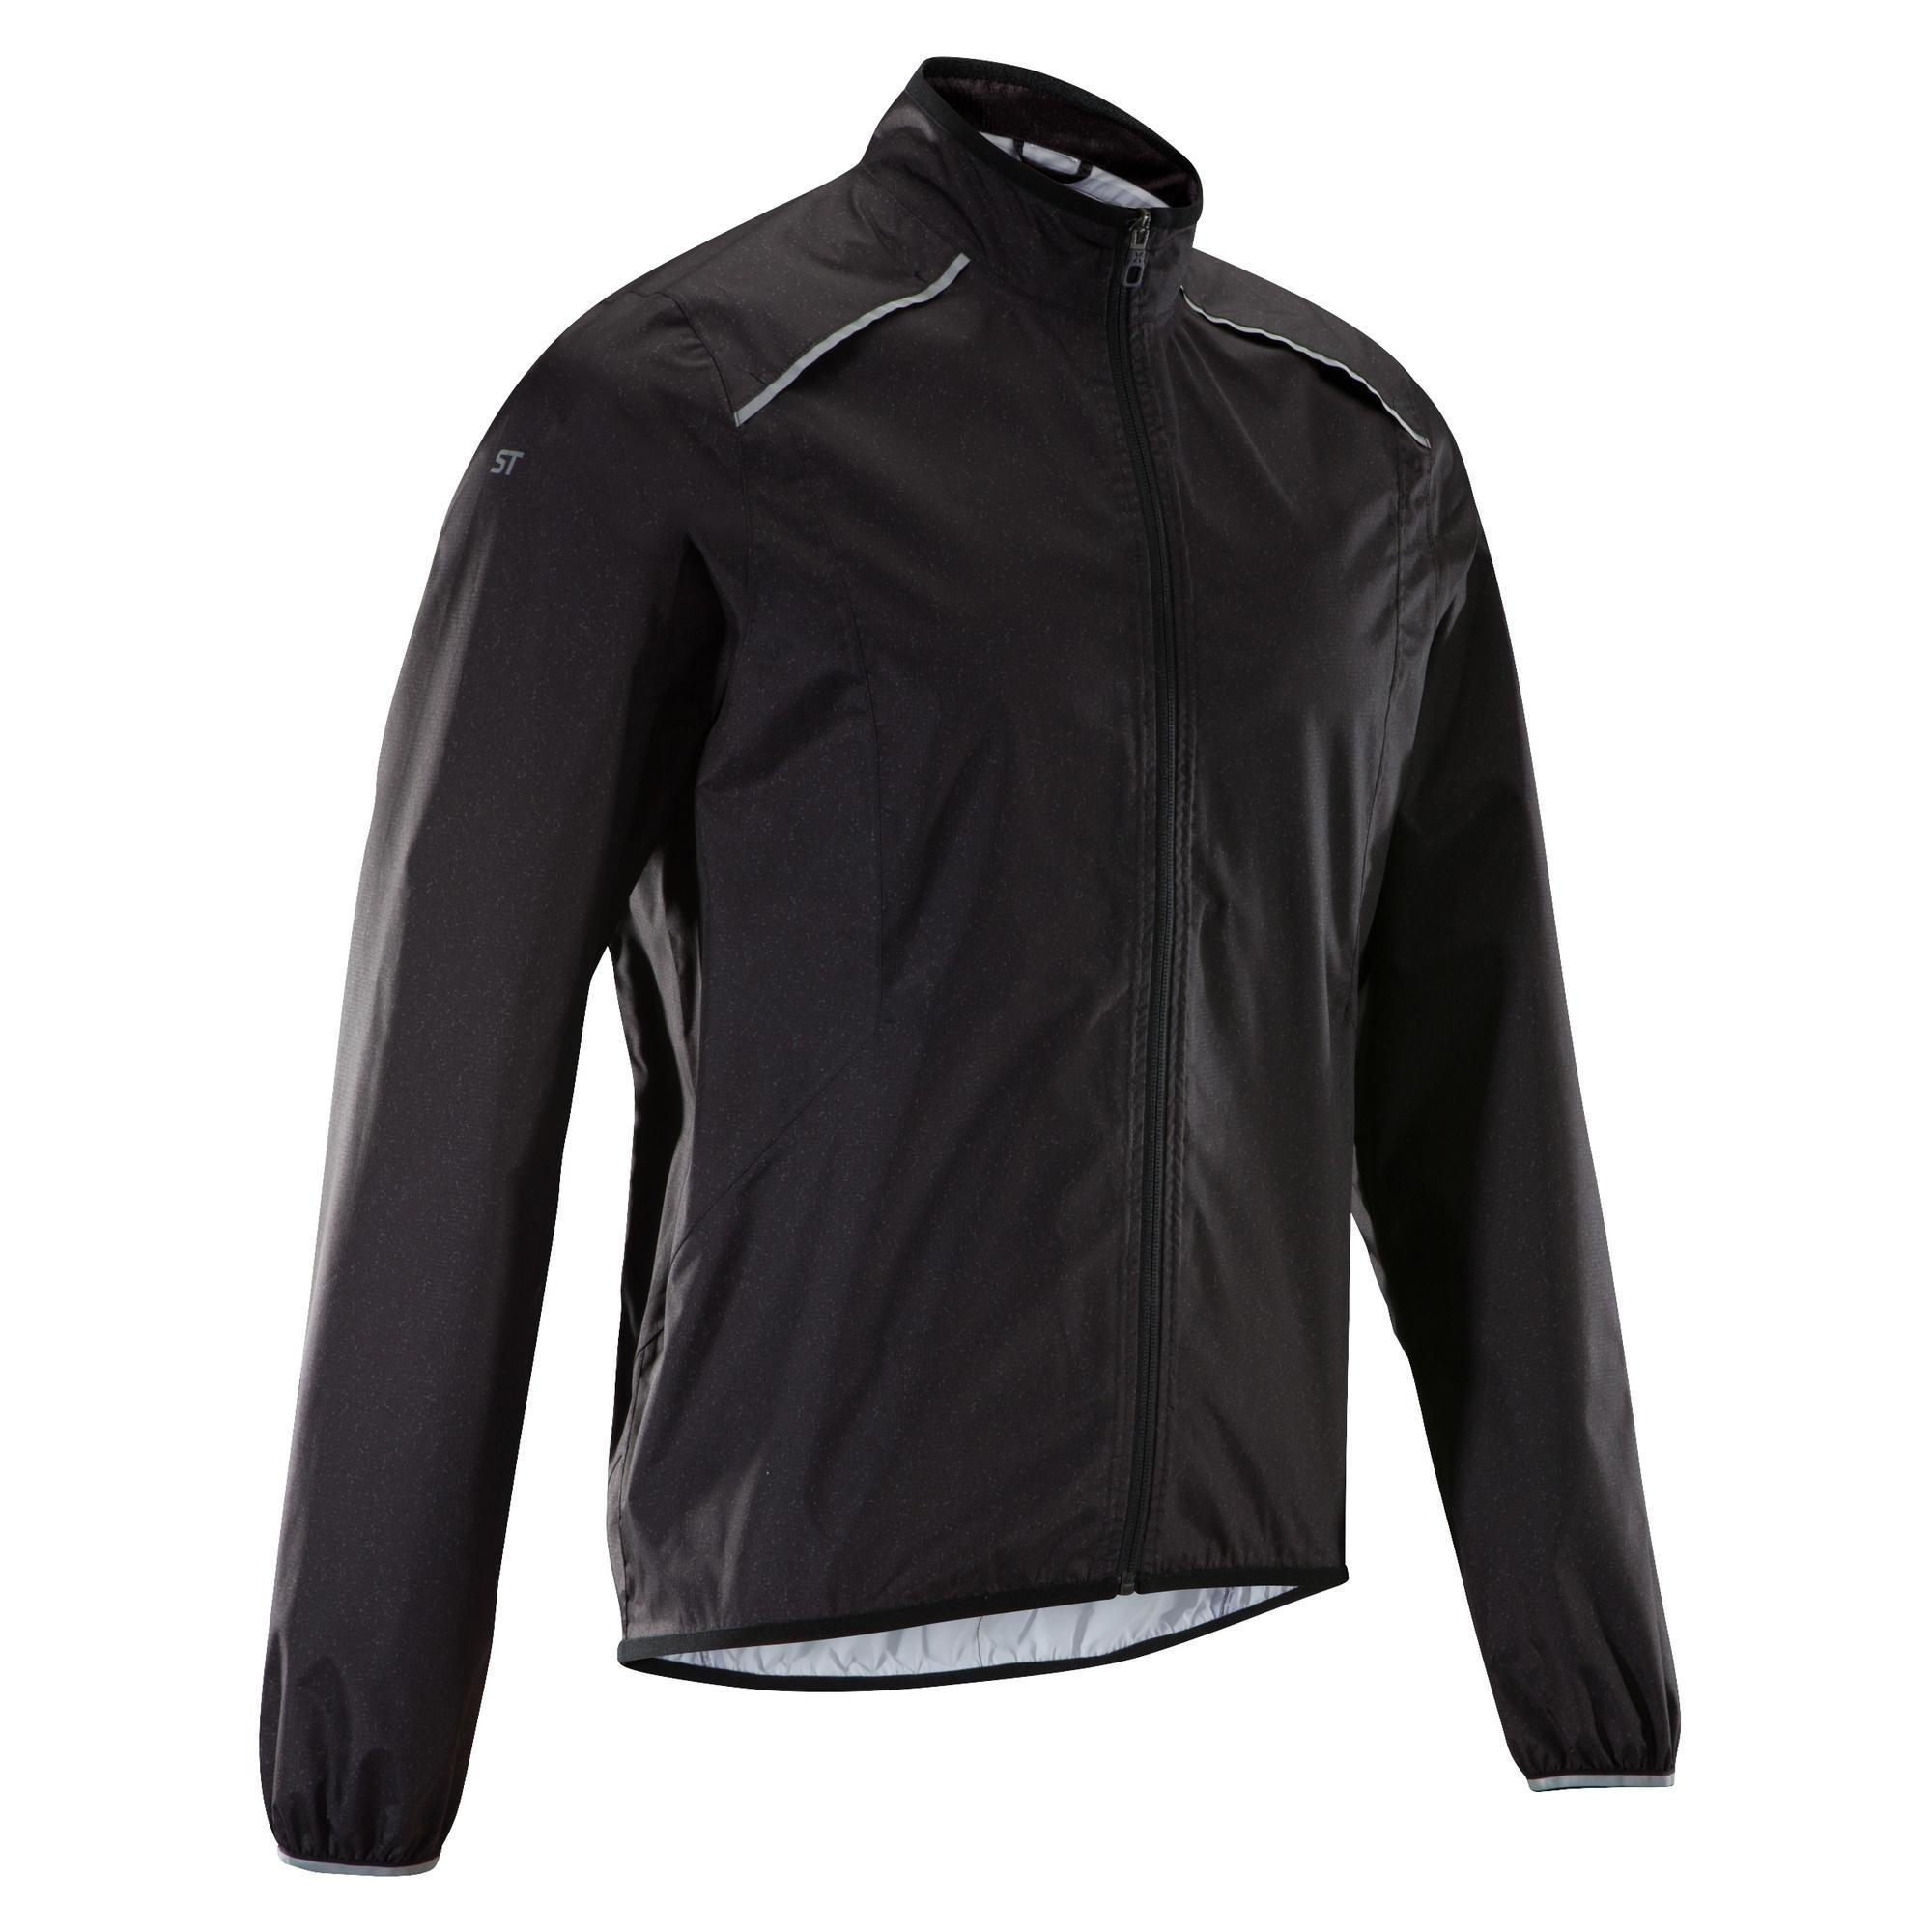 MTB Regenjacke ST 500 | Sportbekleidung > Sportjacken > Regenjacken | Rockrider